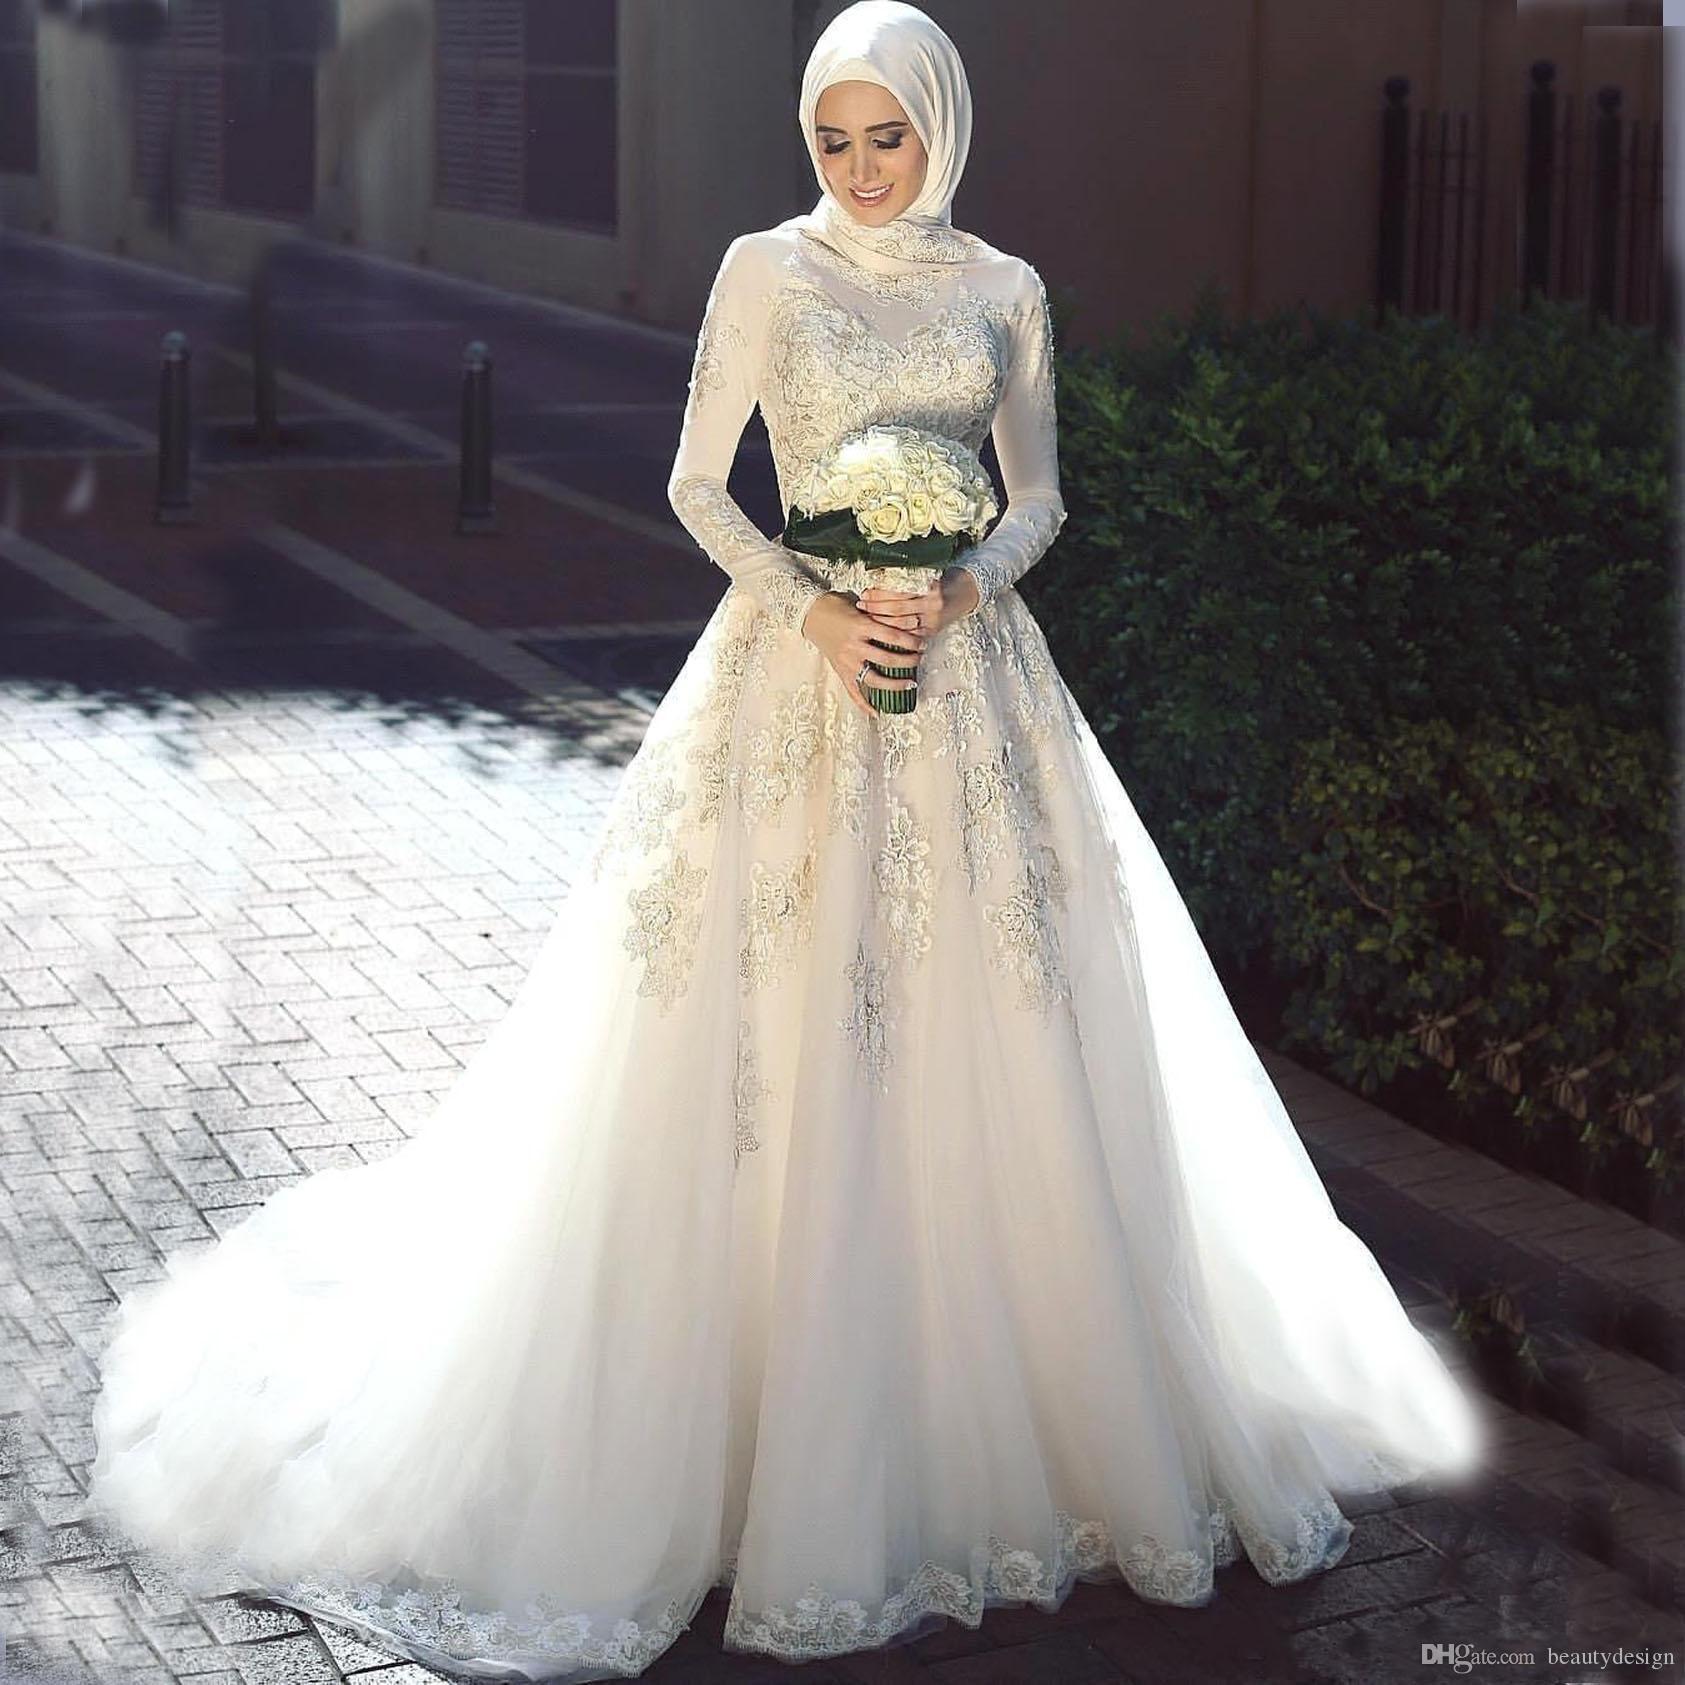 Discount Saudi Arabic Muslim Wedding Dresses Elegant 2018 High Neck Lace  Long Sleeves Sweep Train Appliques Vintage Pakistan Bridal Gown BA810  Wedding ... dd23d315d1f4